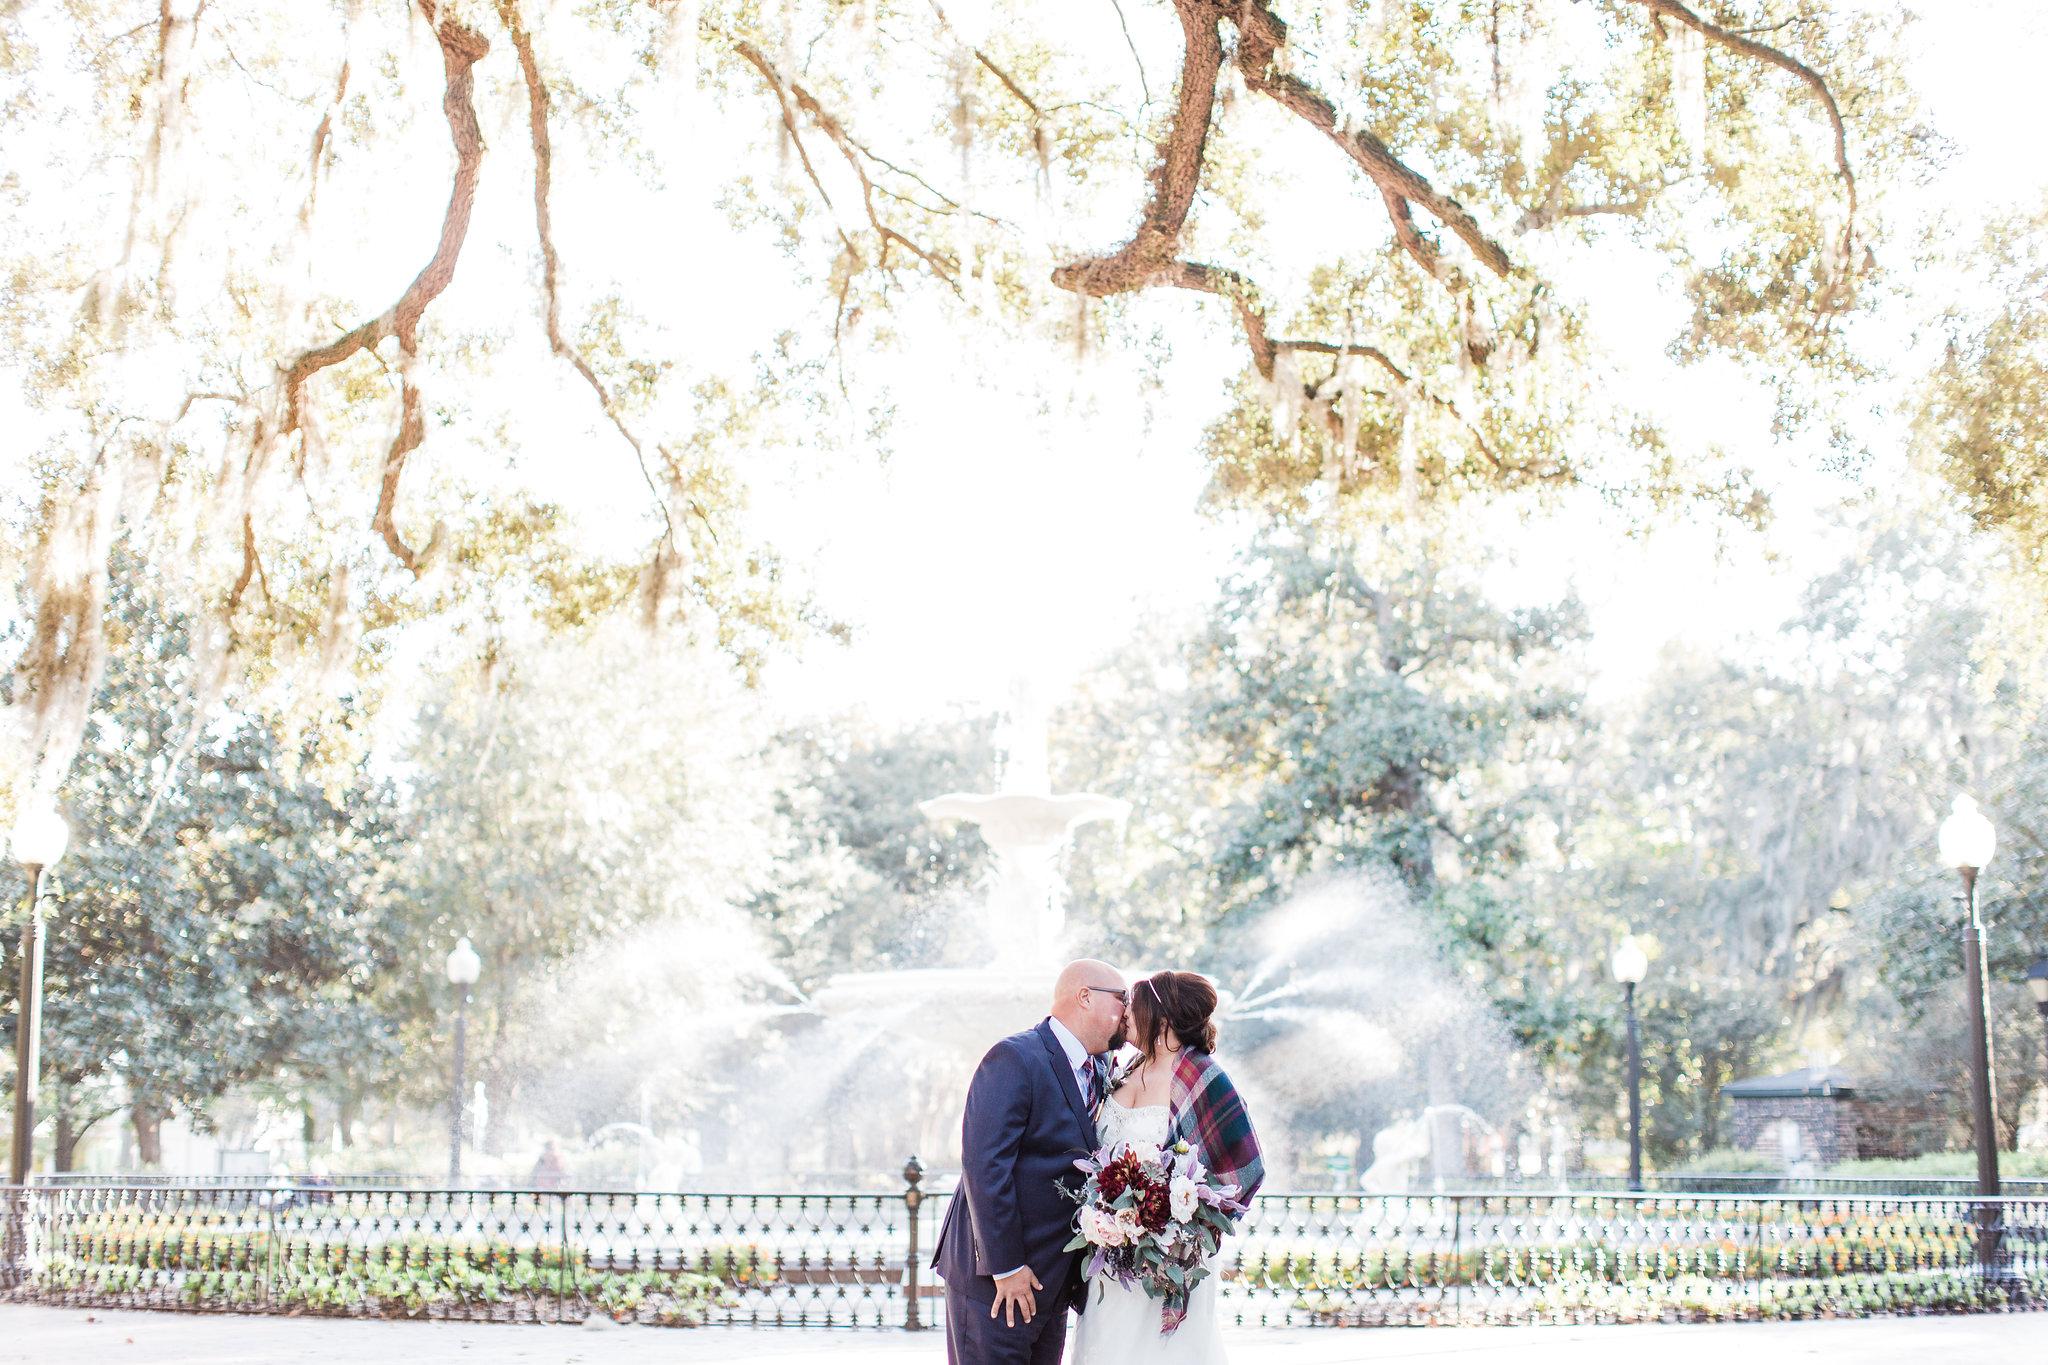 apt-b-photography-kristy-rob-wormsloe-elopment-savannah-wedding-photographer-savannah-elopement-wormsloe-wedding-historic-savannah-elopement-photographer-forsyth-fountain-savannah-39.jpg